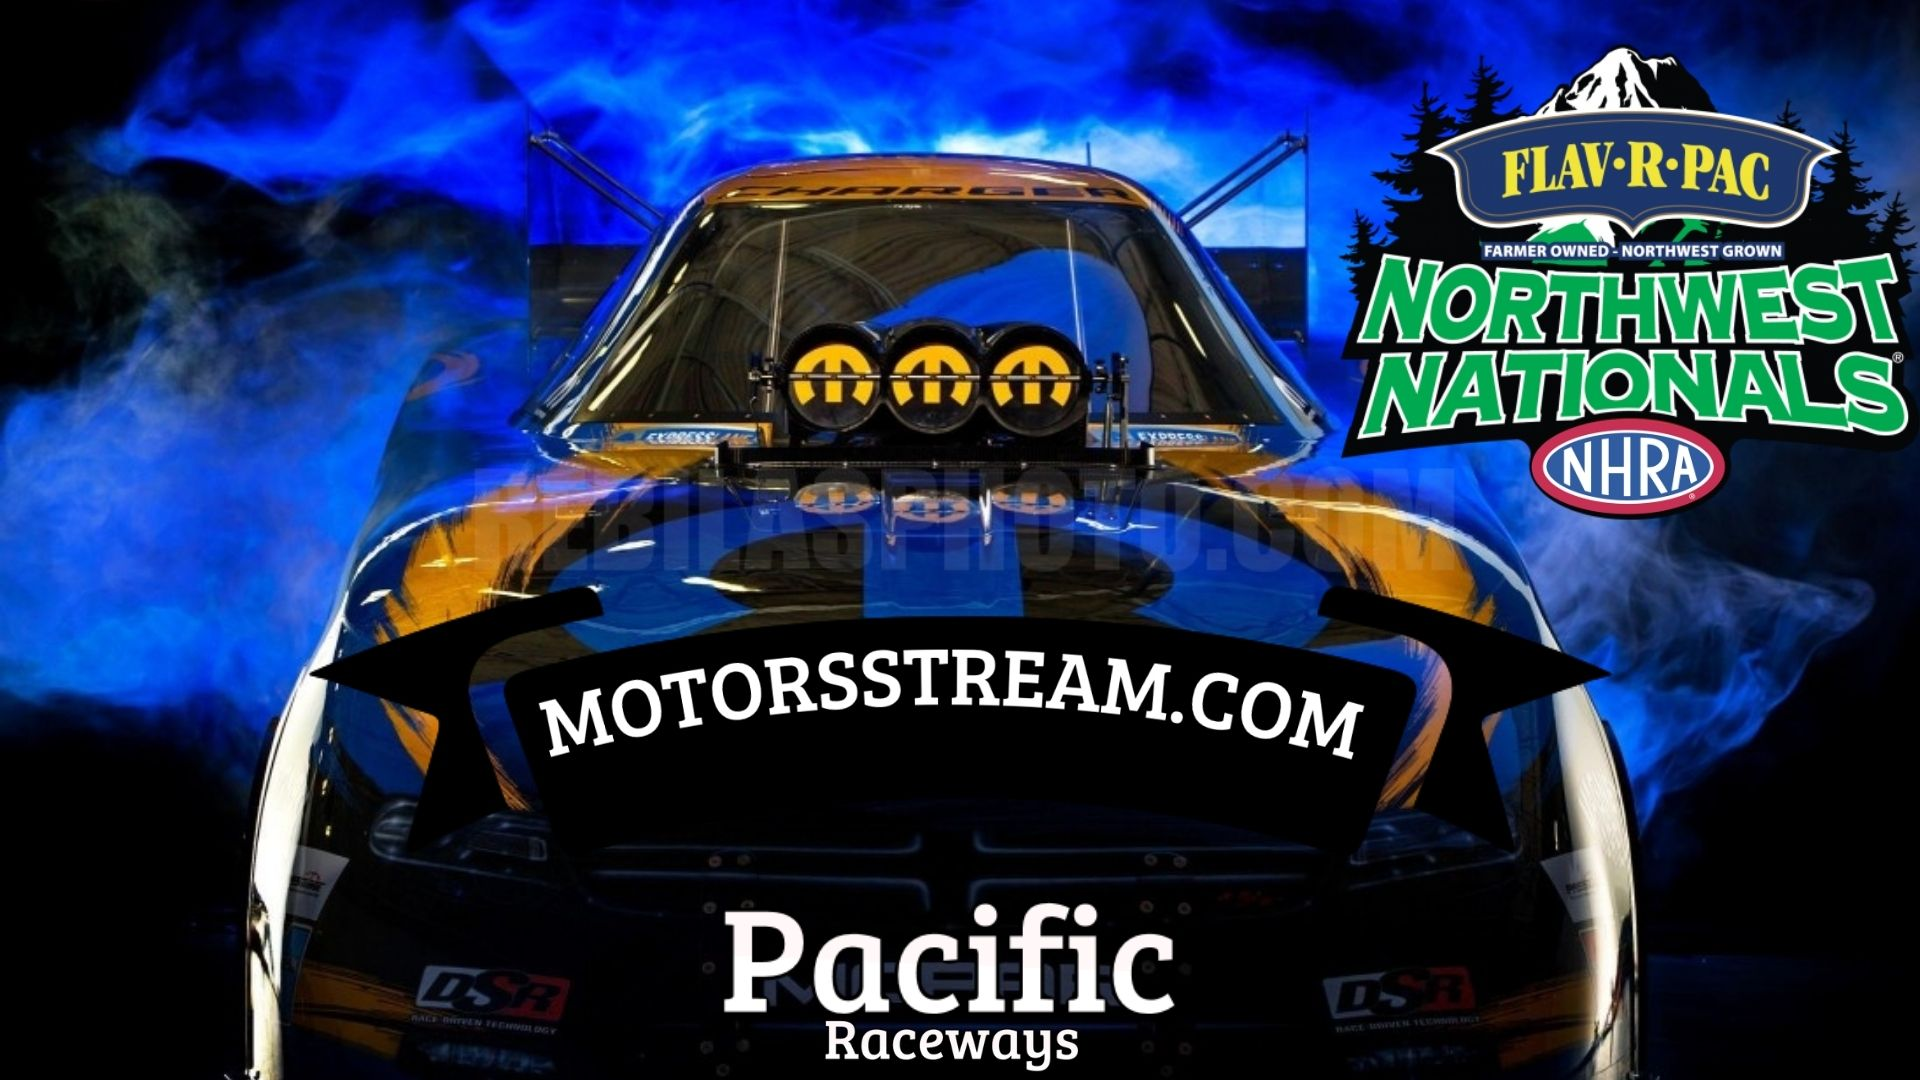 Flav R Pac NHRA Northwest Nationals 2021 Live Stream